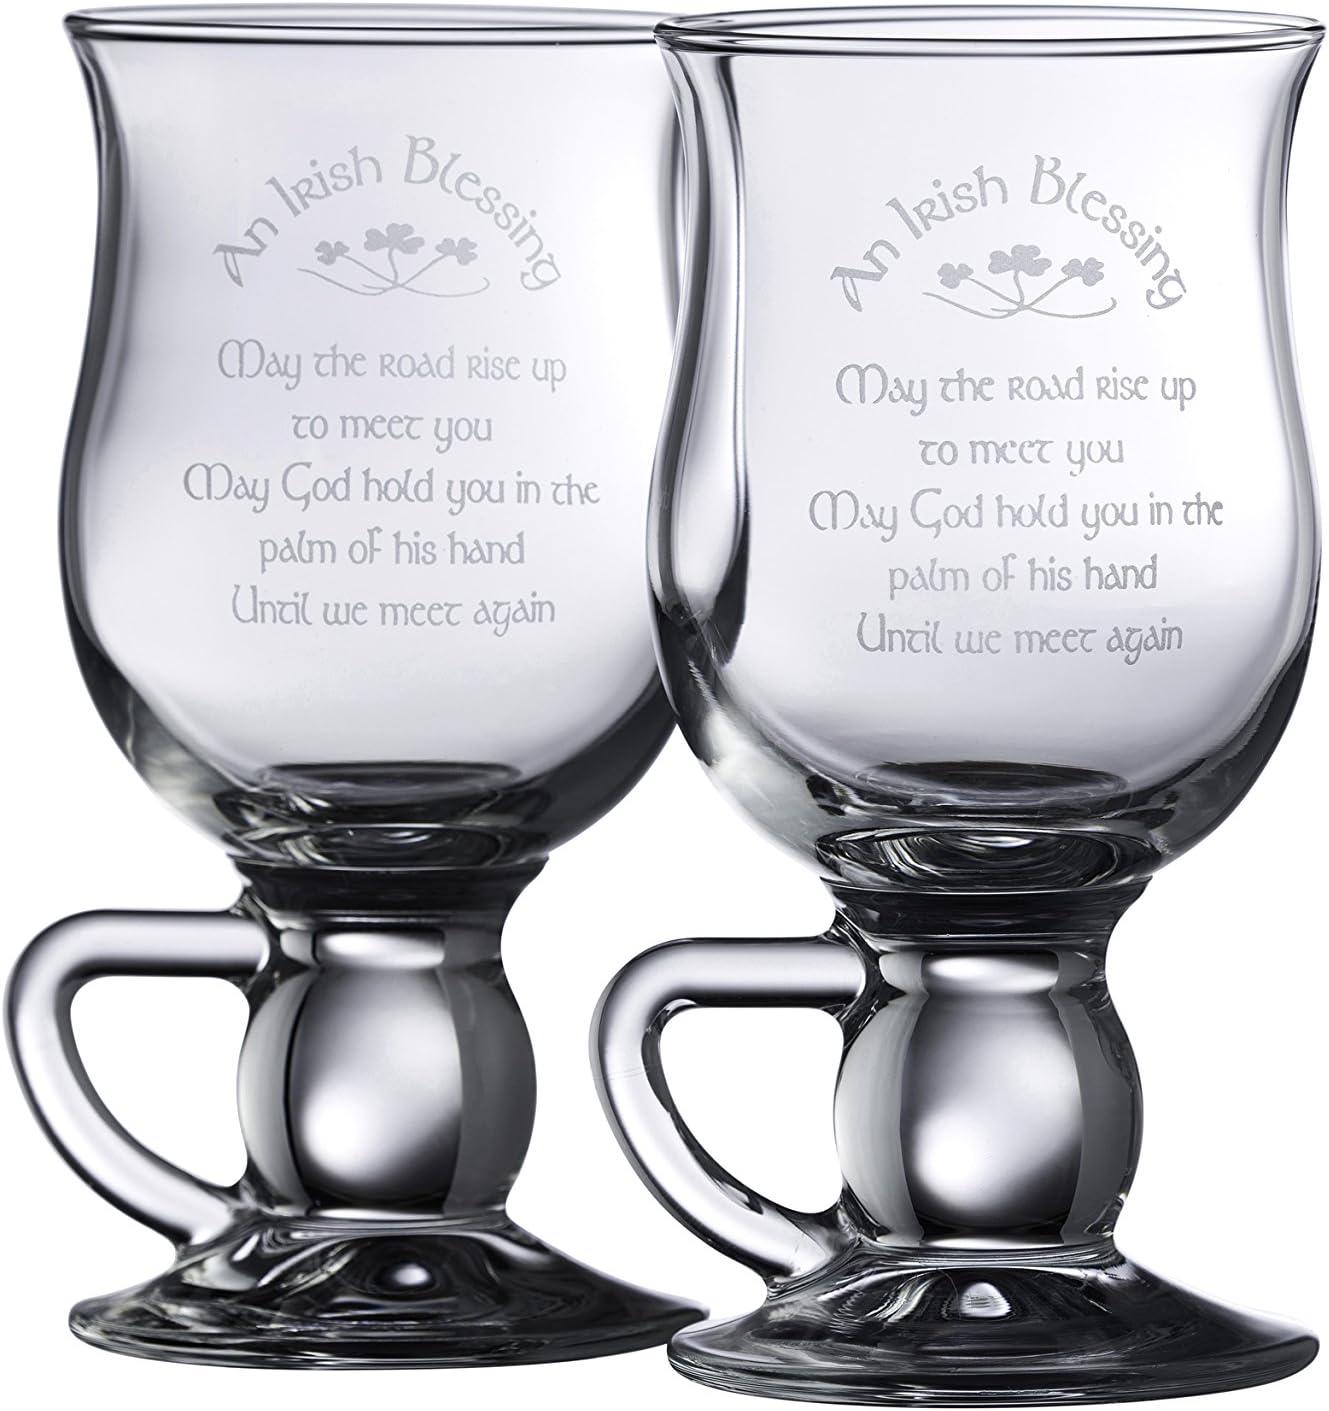 Galway Crystal Irish Blessing 5 Elegant popular 1 Pair Clear Latte